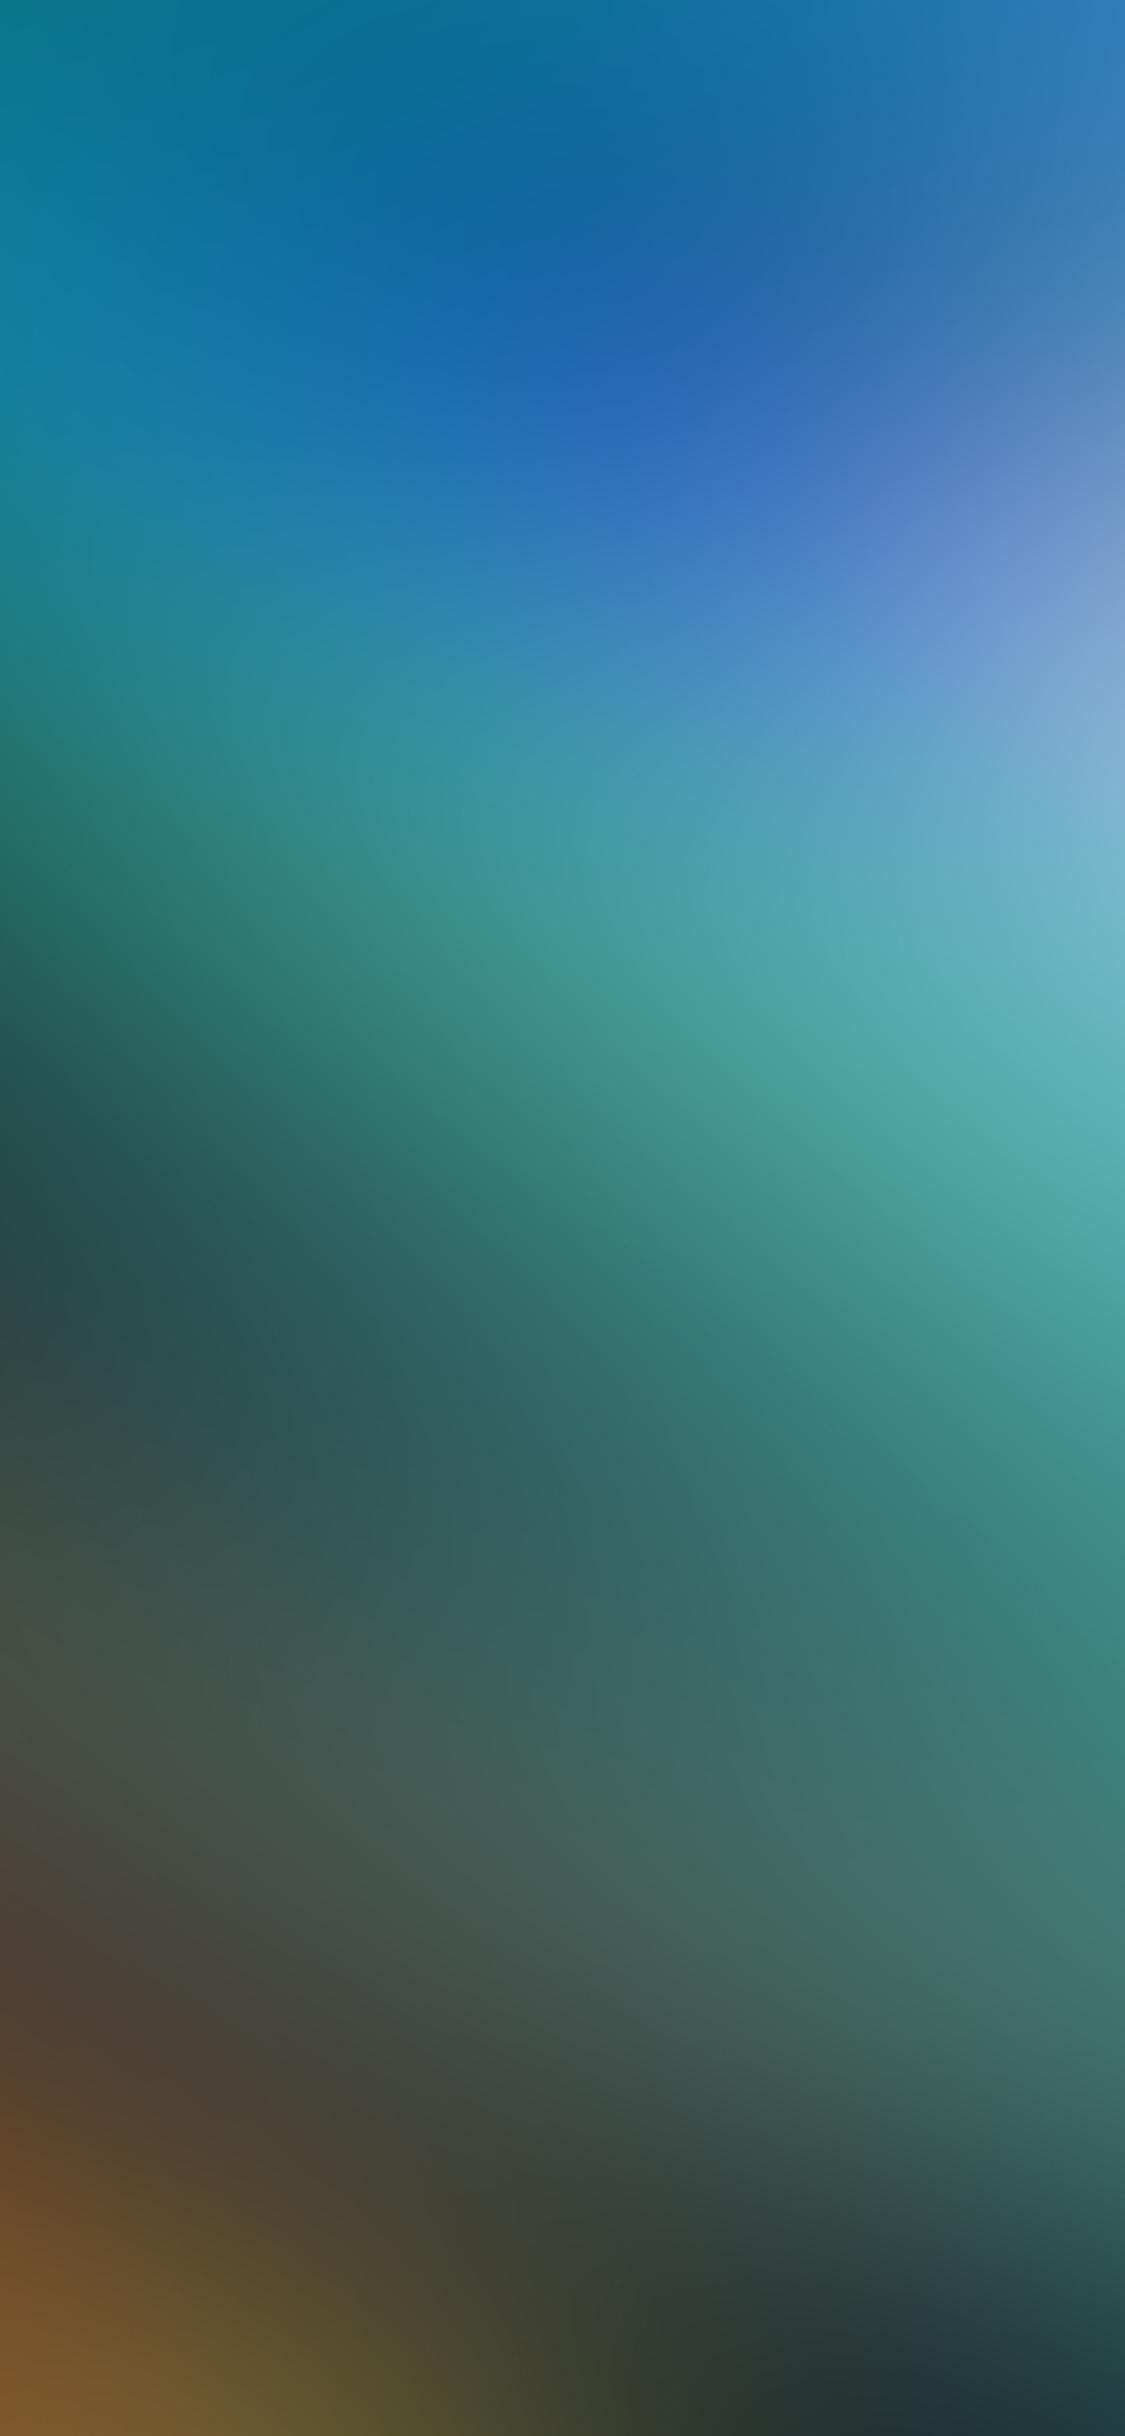 iPhoneXpapers.com-Apple-iPhone-wallpaper-sj03-blue-rainbow-blur